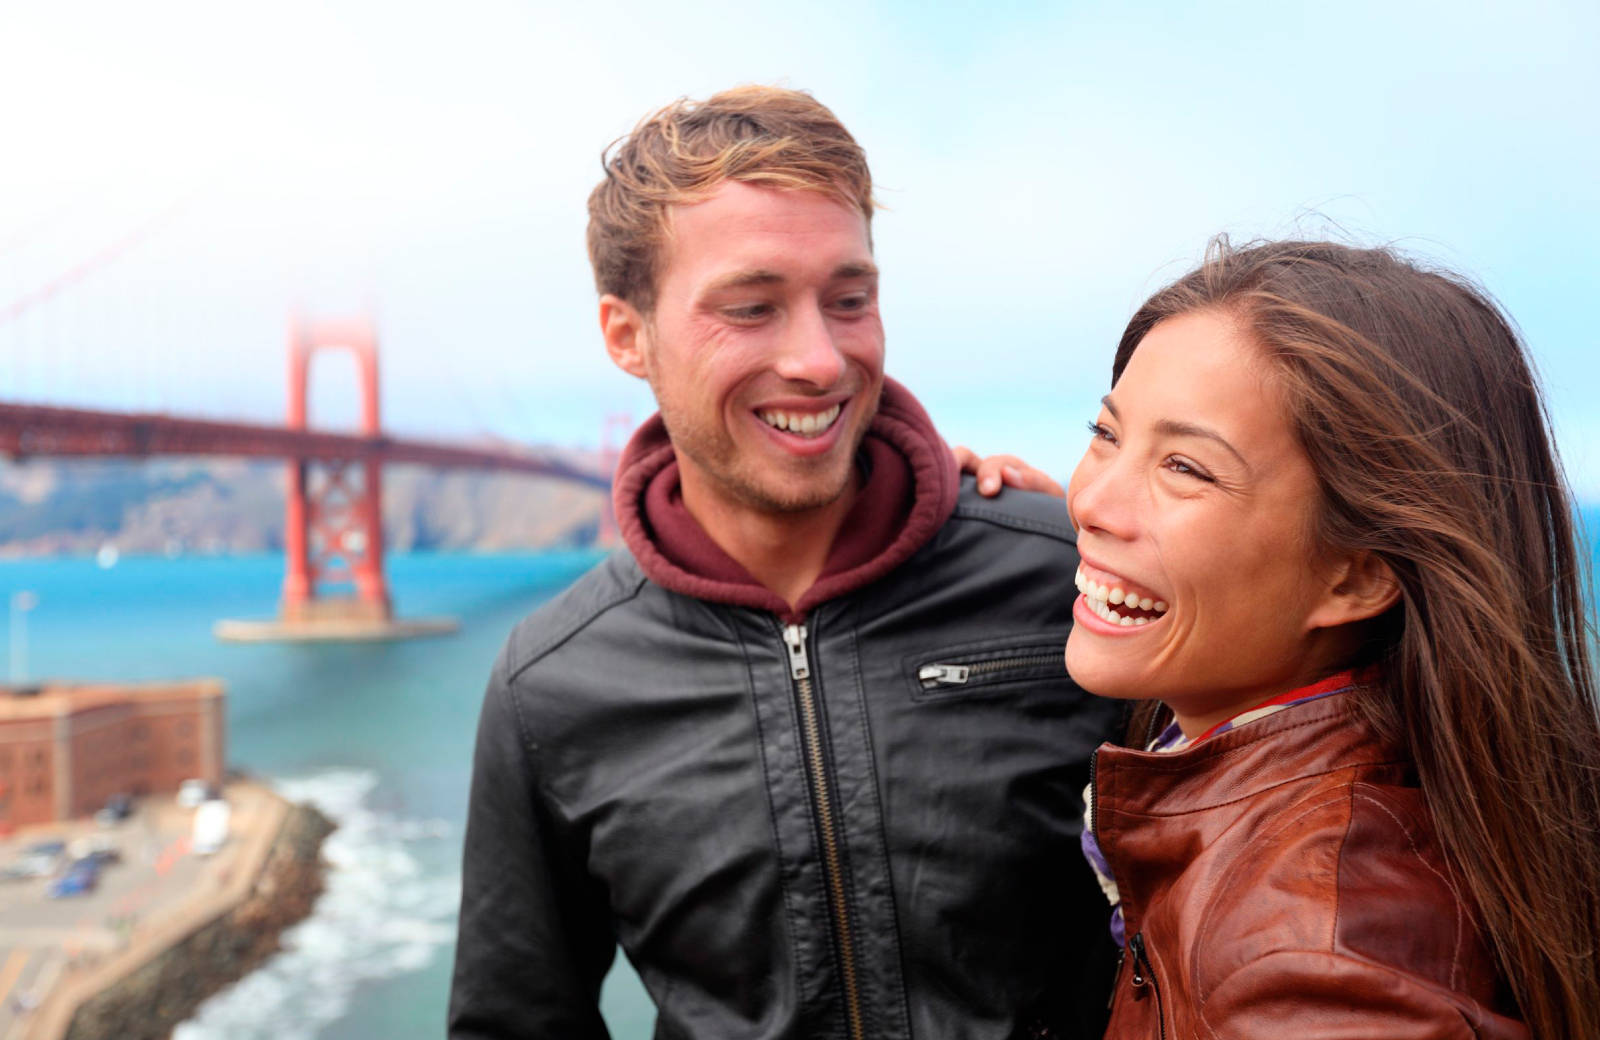 Amazing Weekend Getaways in the San Francisco Bay Area